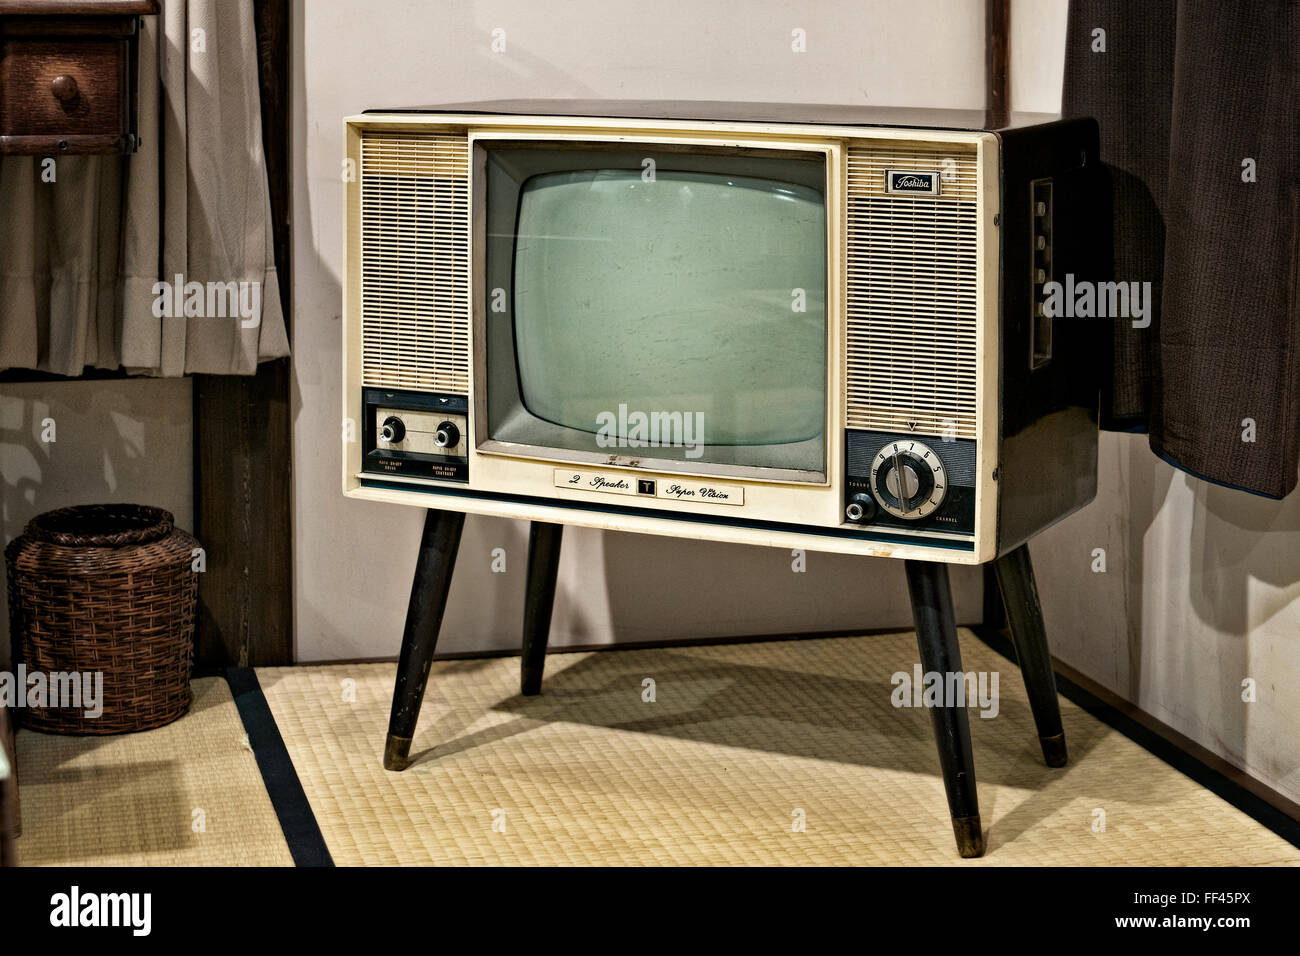 Japan, Honshu island, Kanto, Tokyo, Shitamachi museum, sixties Toshiba TV set. - Stock Image